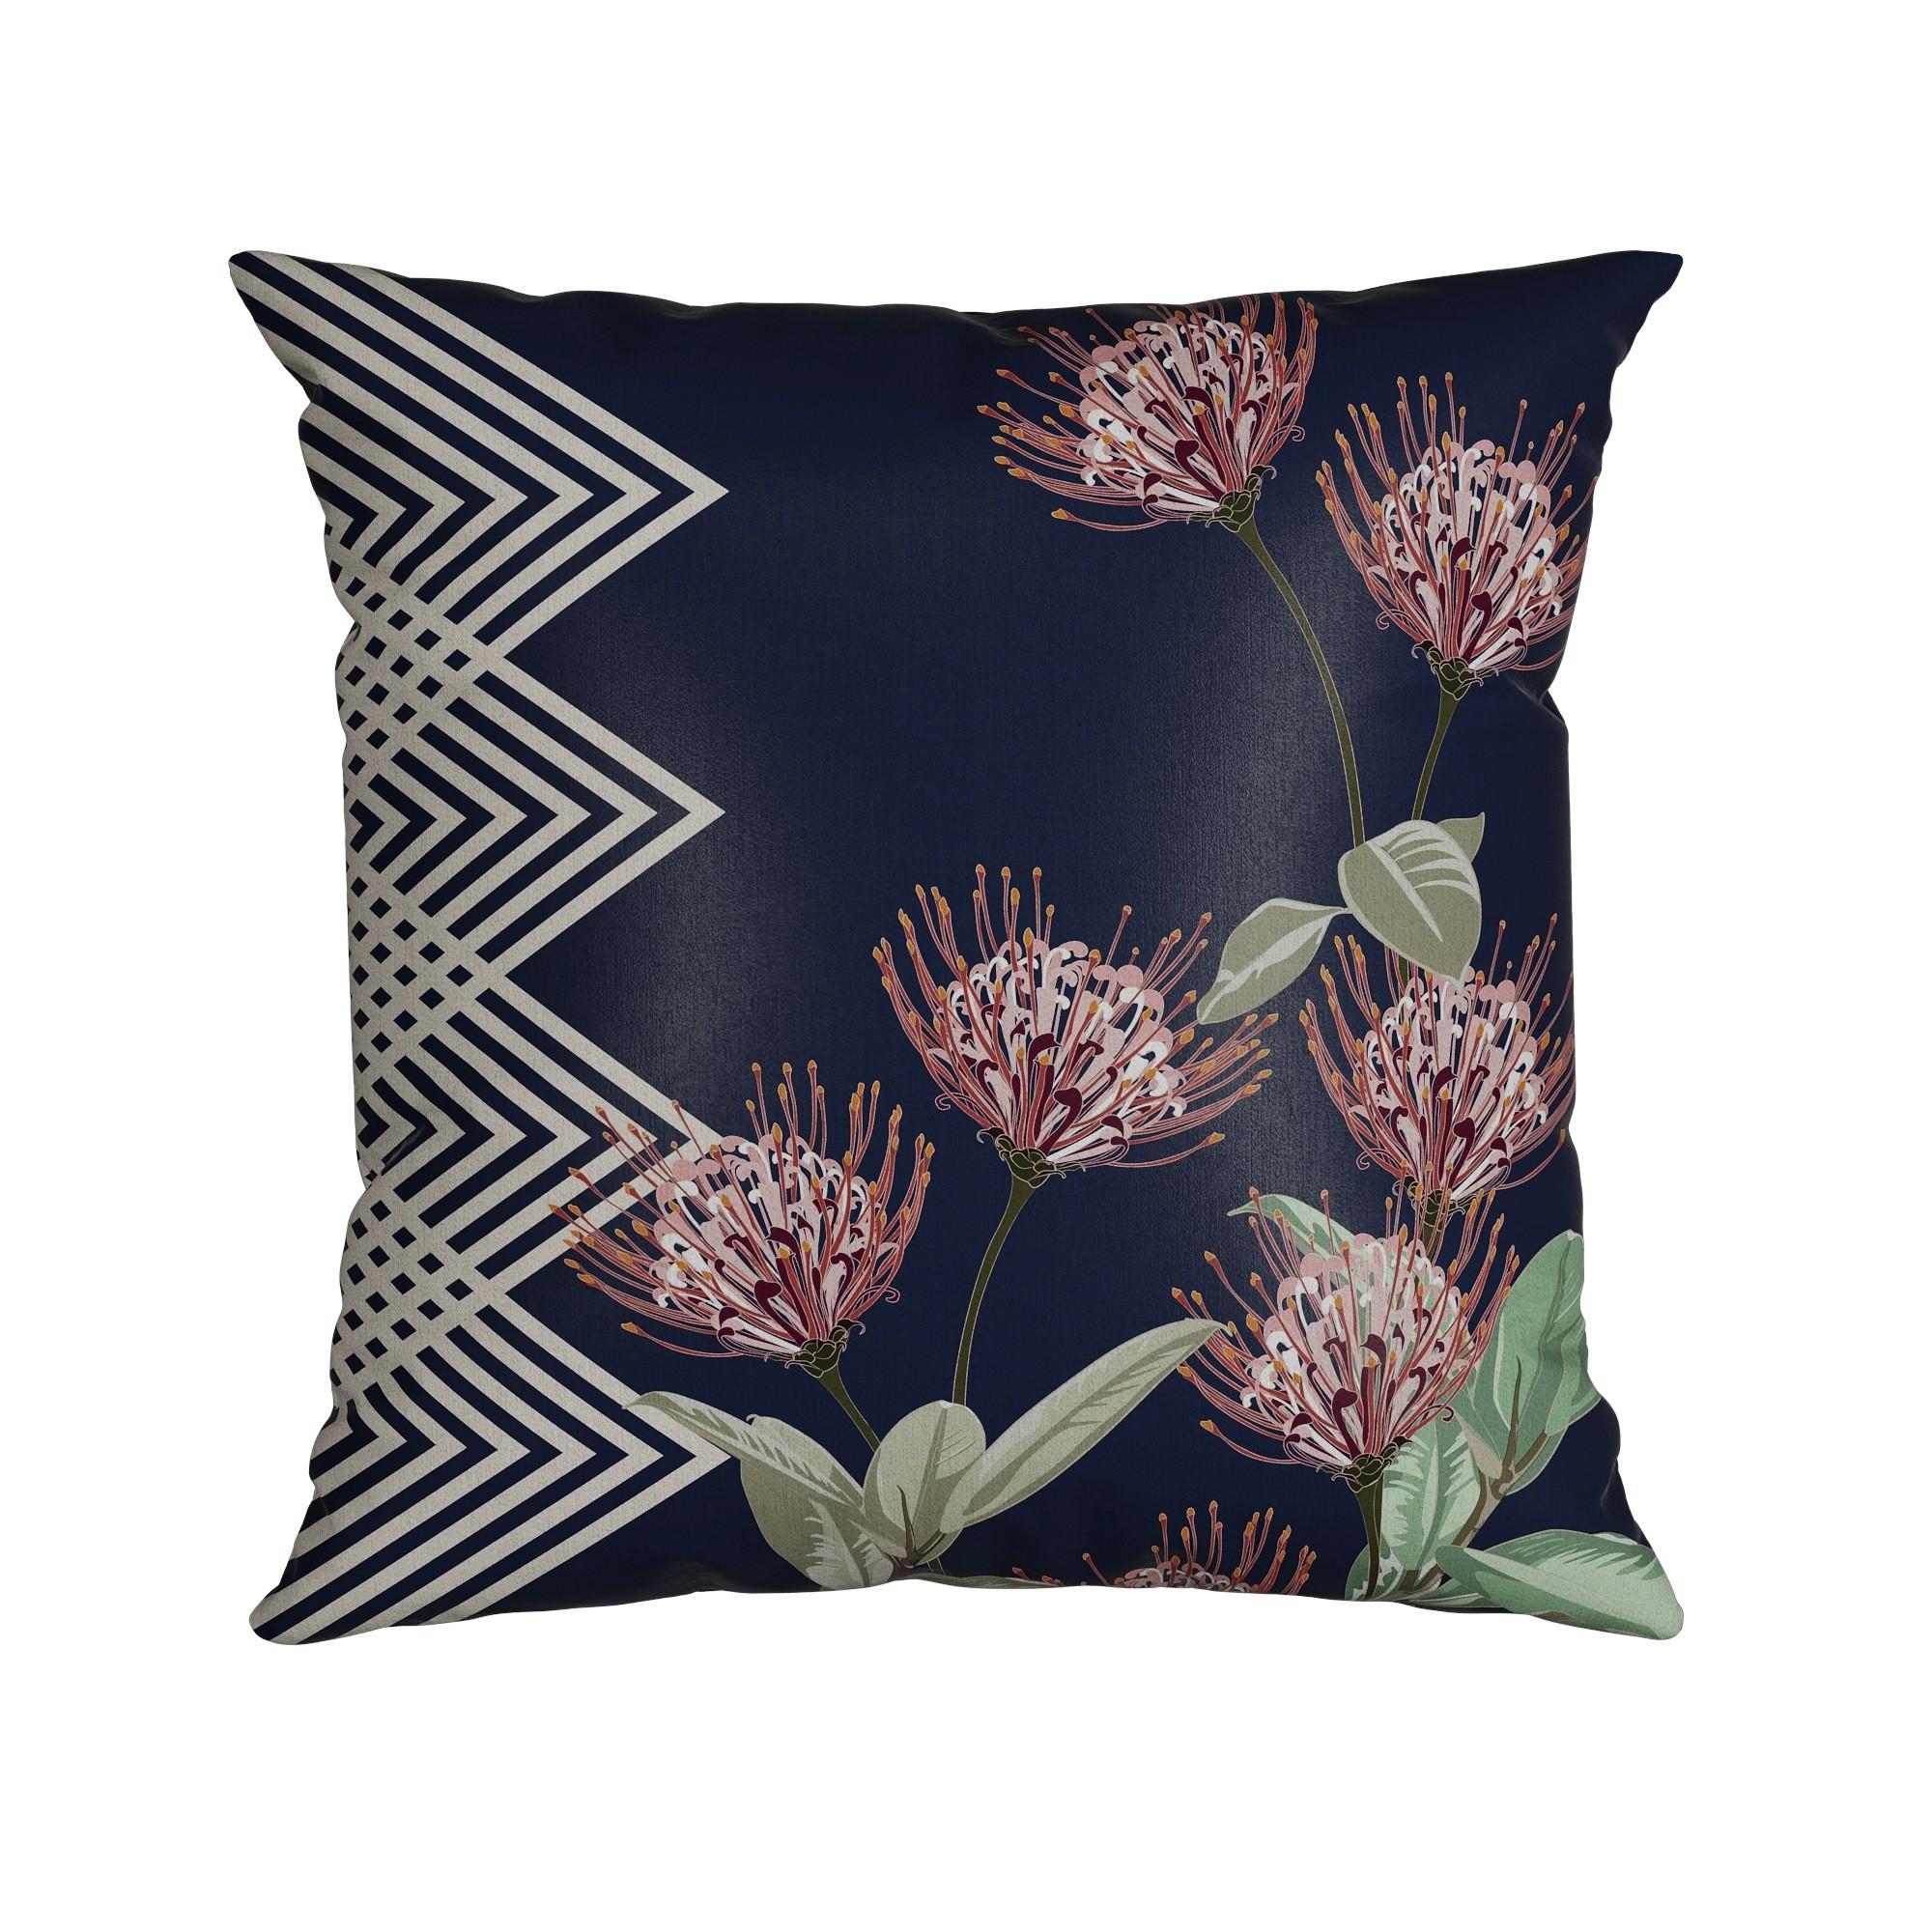 Almofada Silk Home 50x50cm 0480 - Belchior